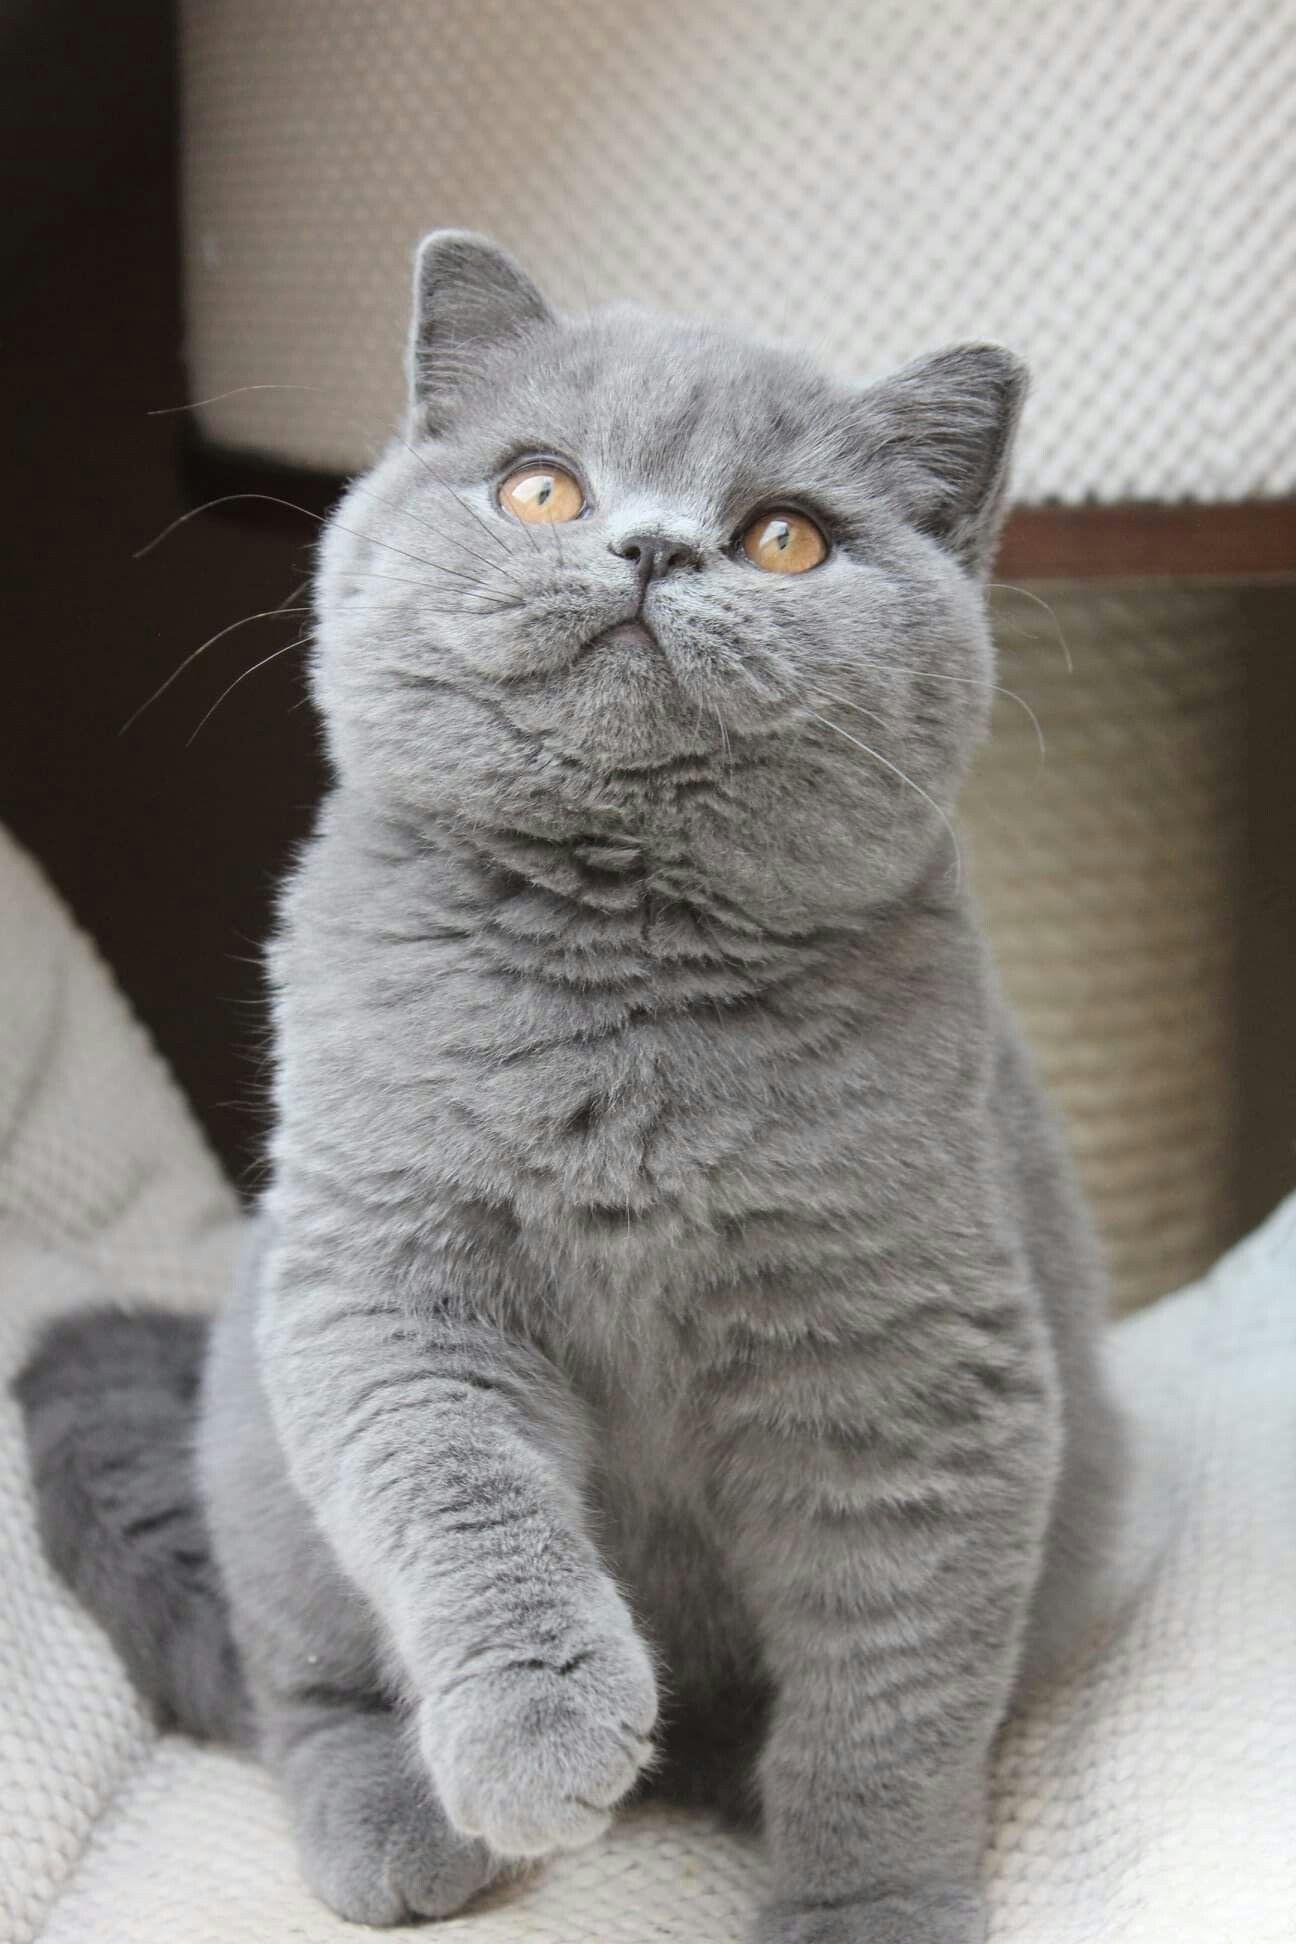 Pin By Heather On British Shorthair Cuties Kitten Breeds Cat Breeds Beautiful Cat Breeds